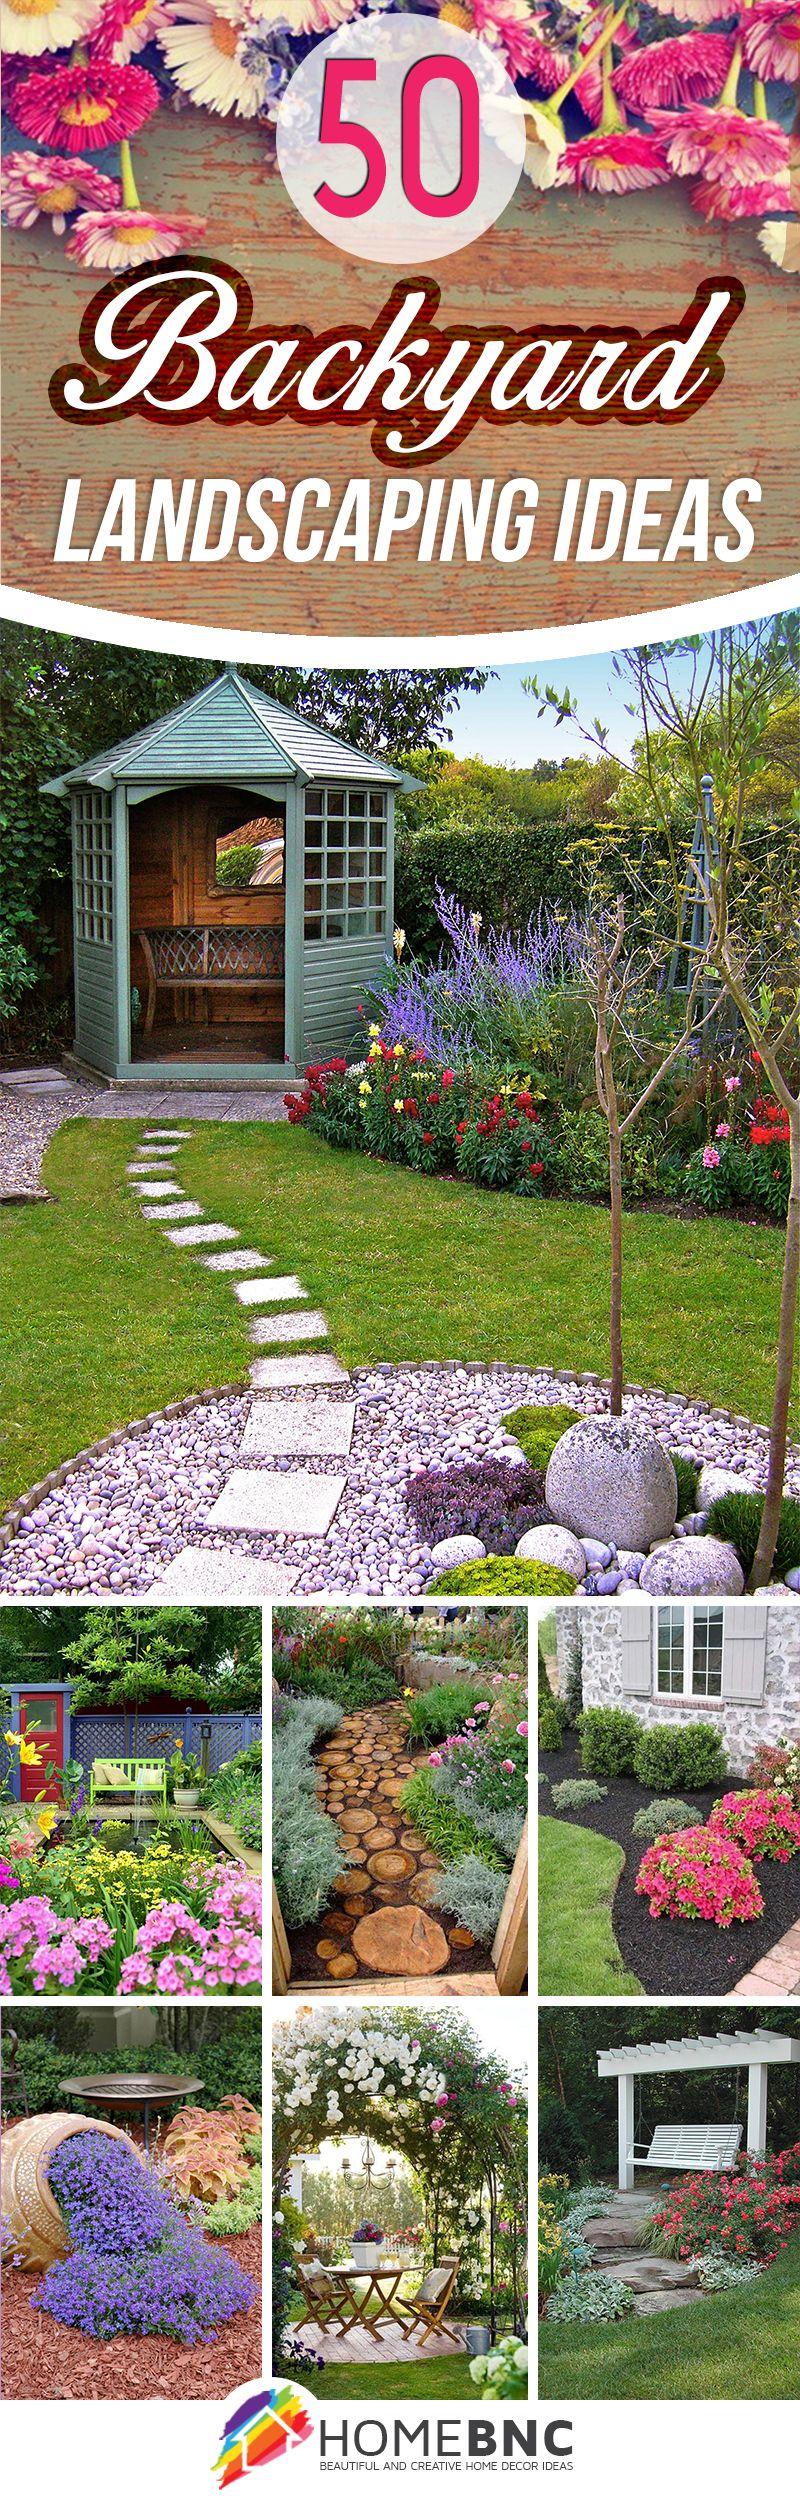 50 Backyard Landscaping Ideas that Will Make